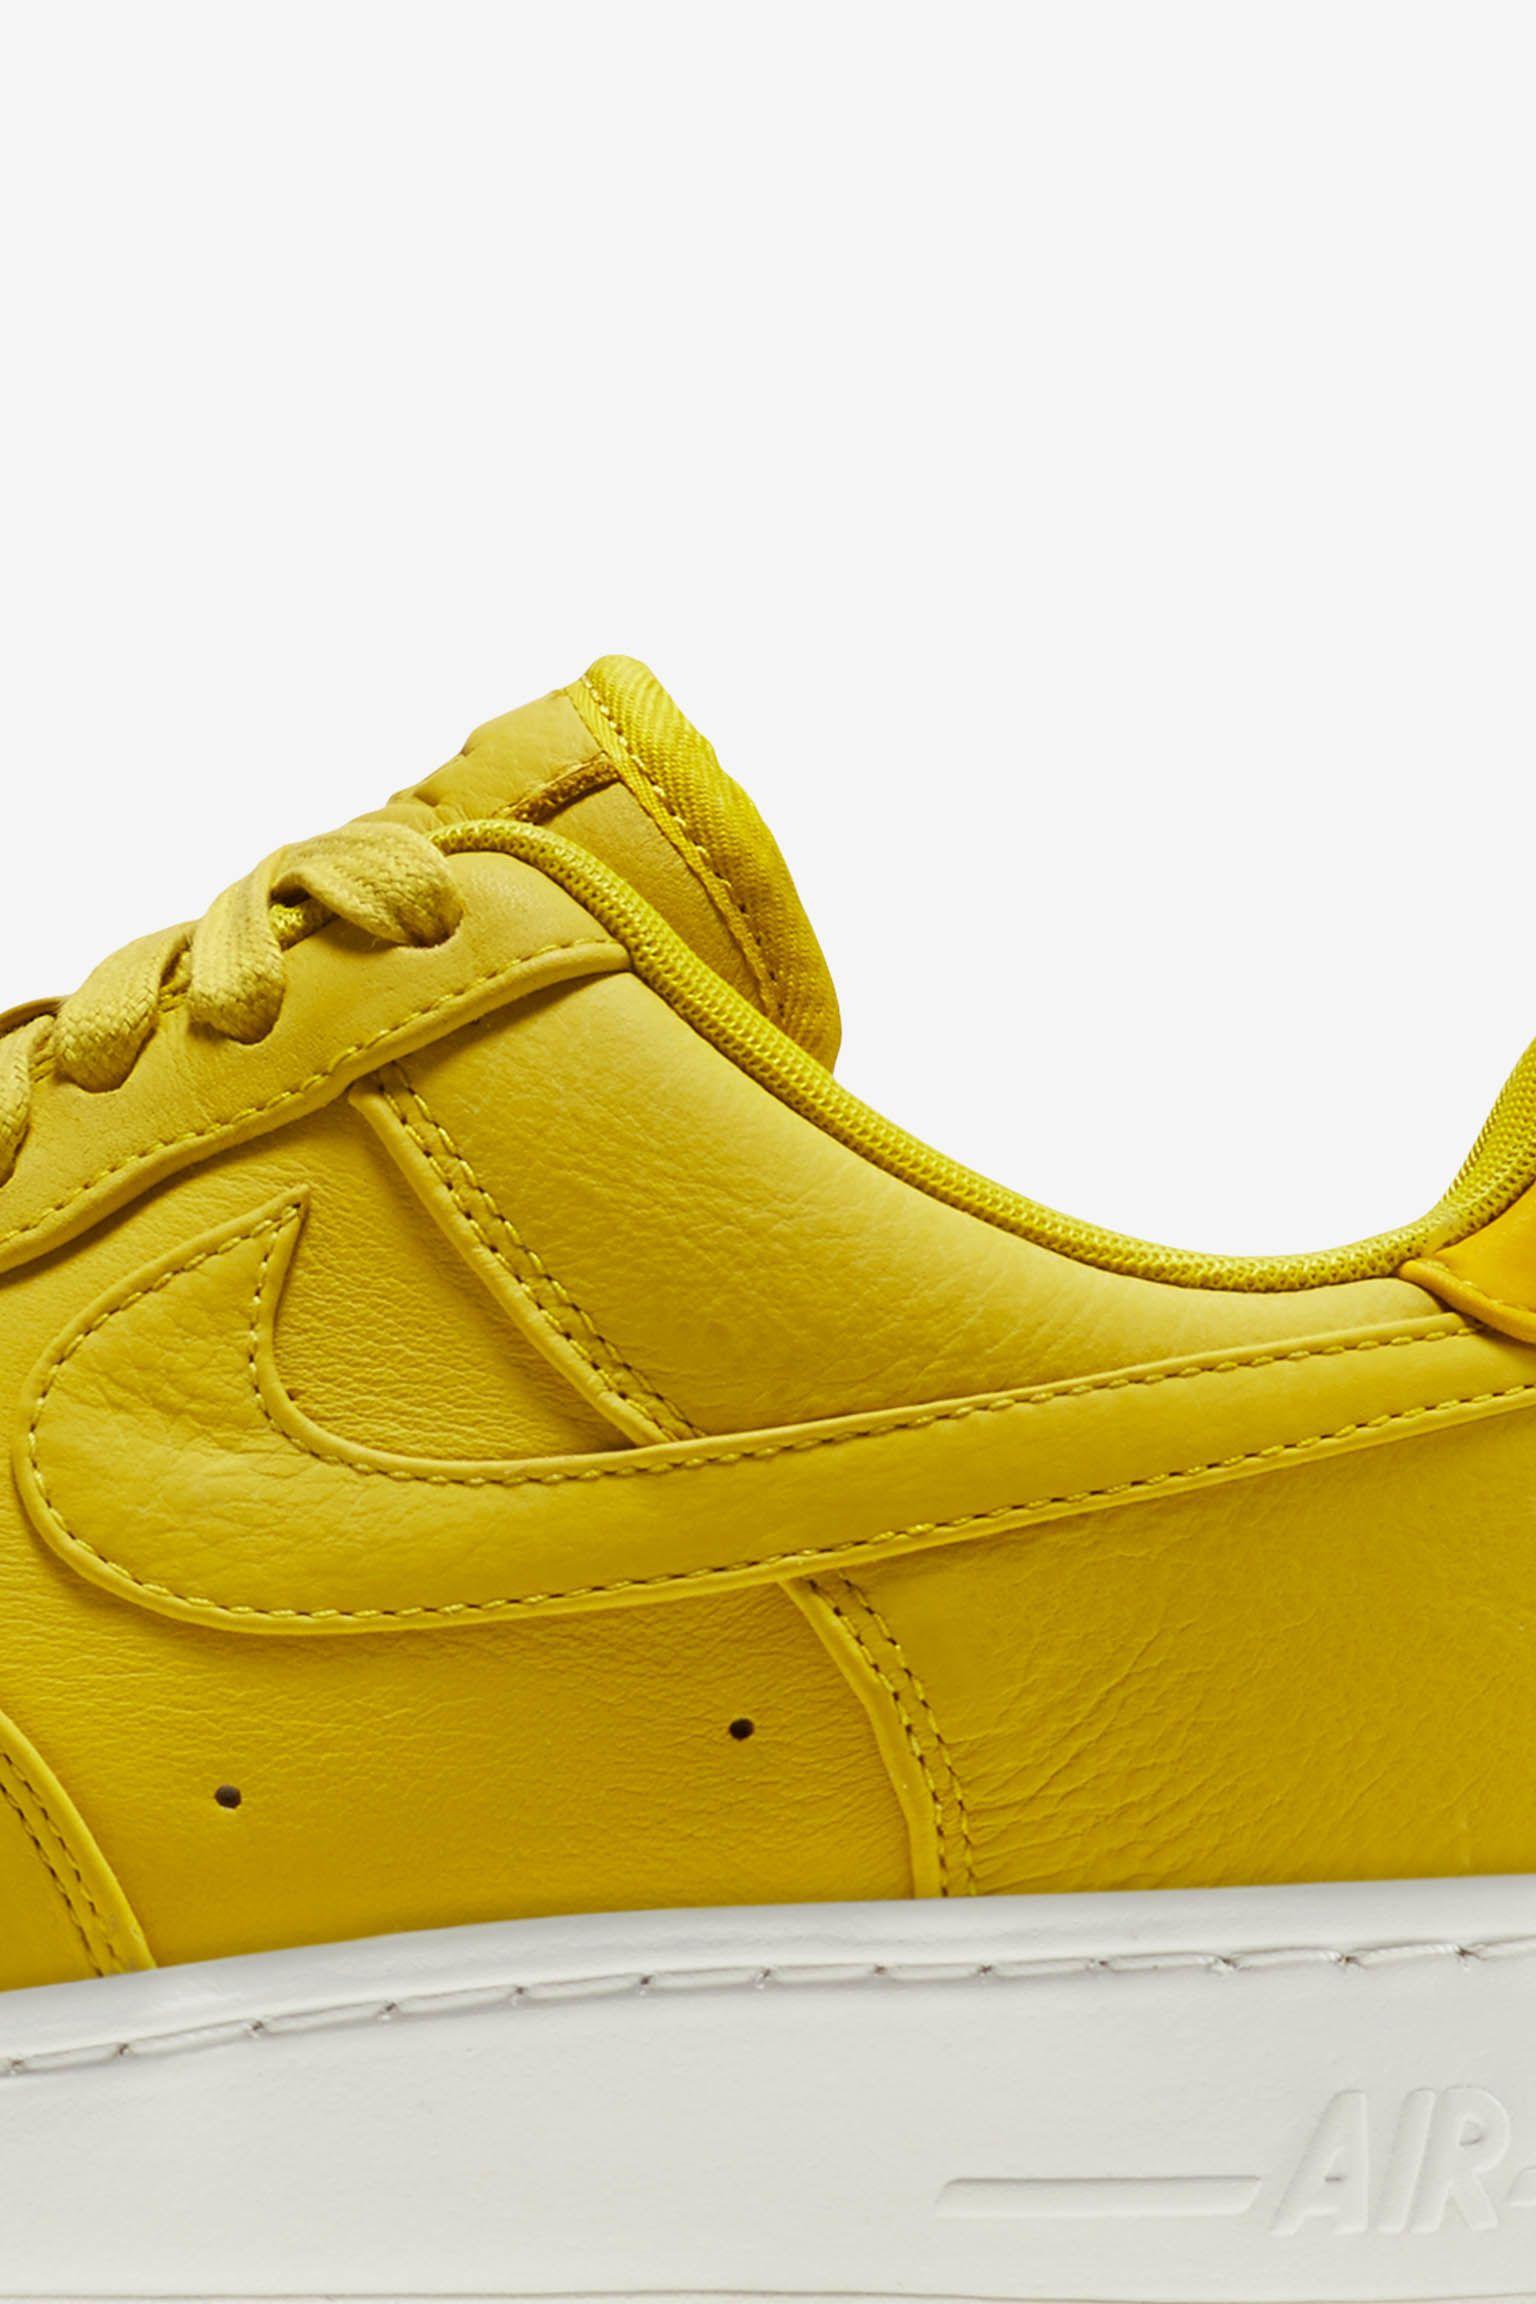 NikeLab Air Force 1 Low 'Bright Citron'